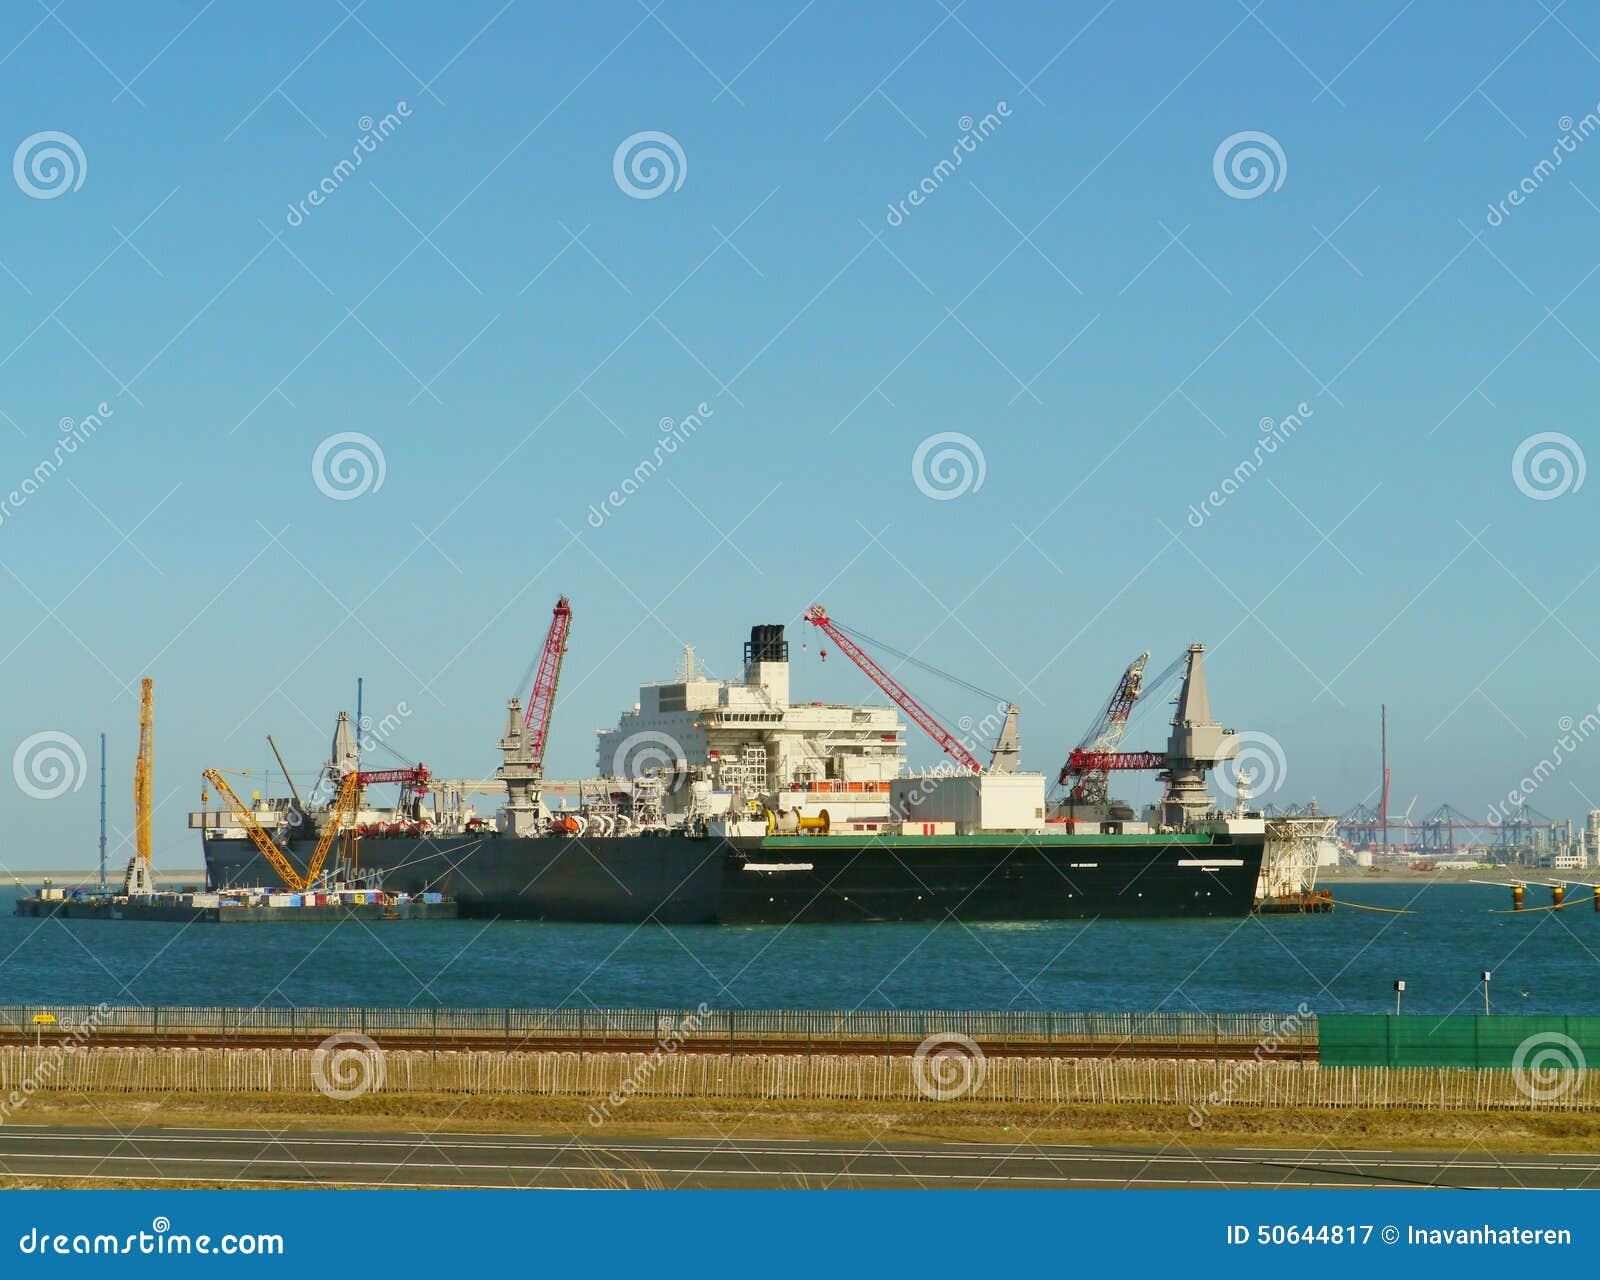 Crane Ship Pioneering Spirit In The Netherlands Editorial